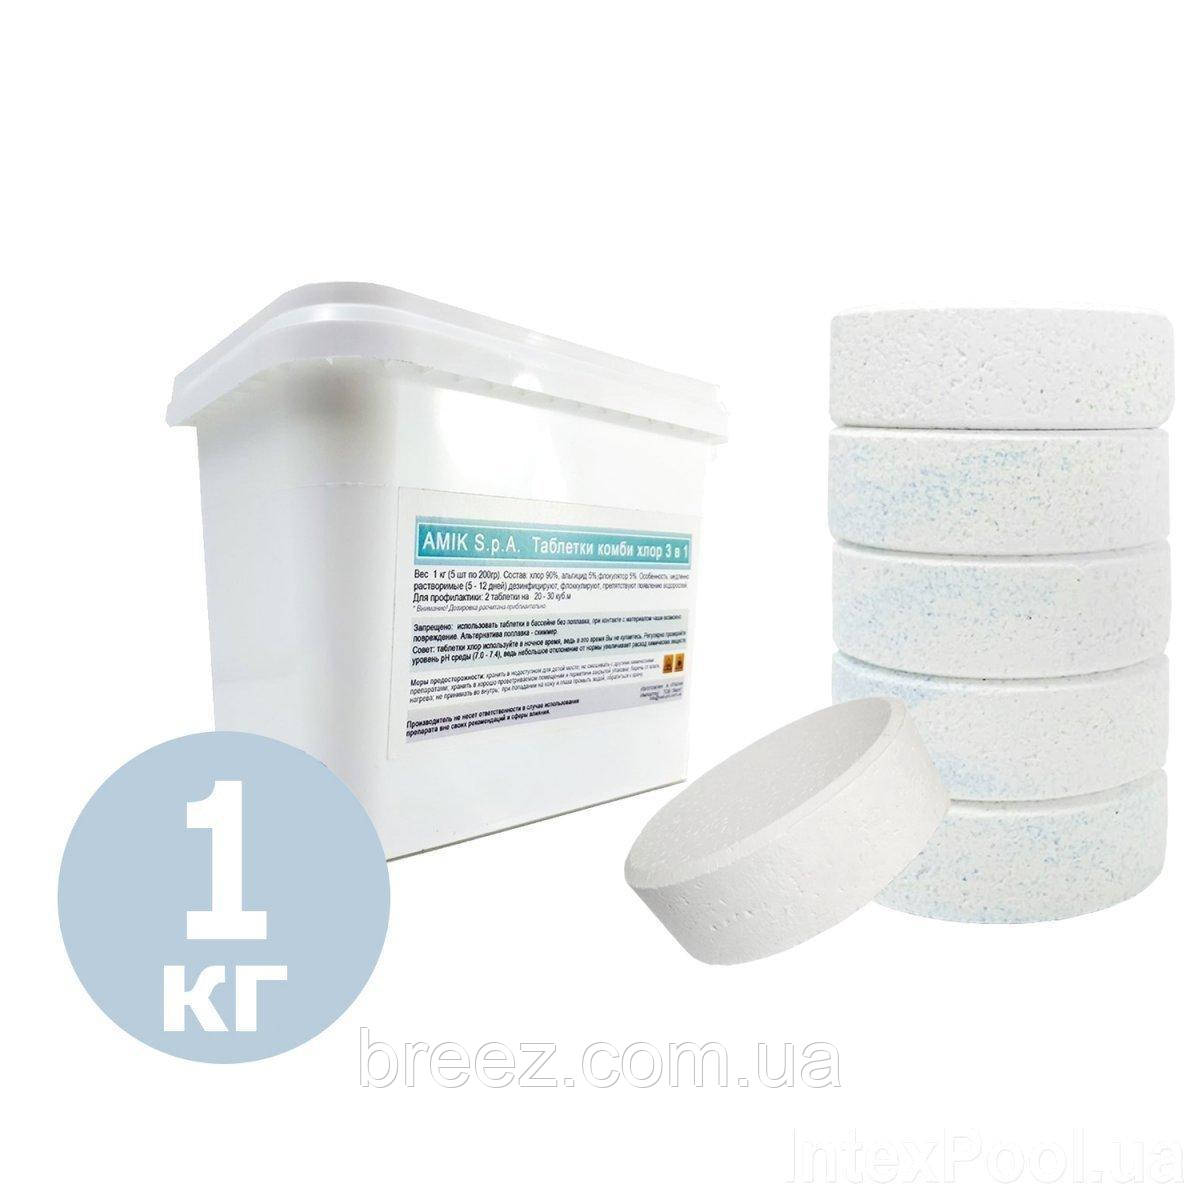 Таблетки для бассейна Комби хлор 3в1 Amik S.p.A 80002 1 кг Италия